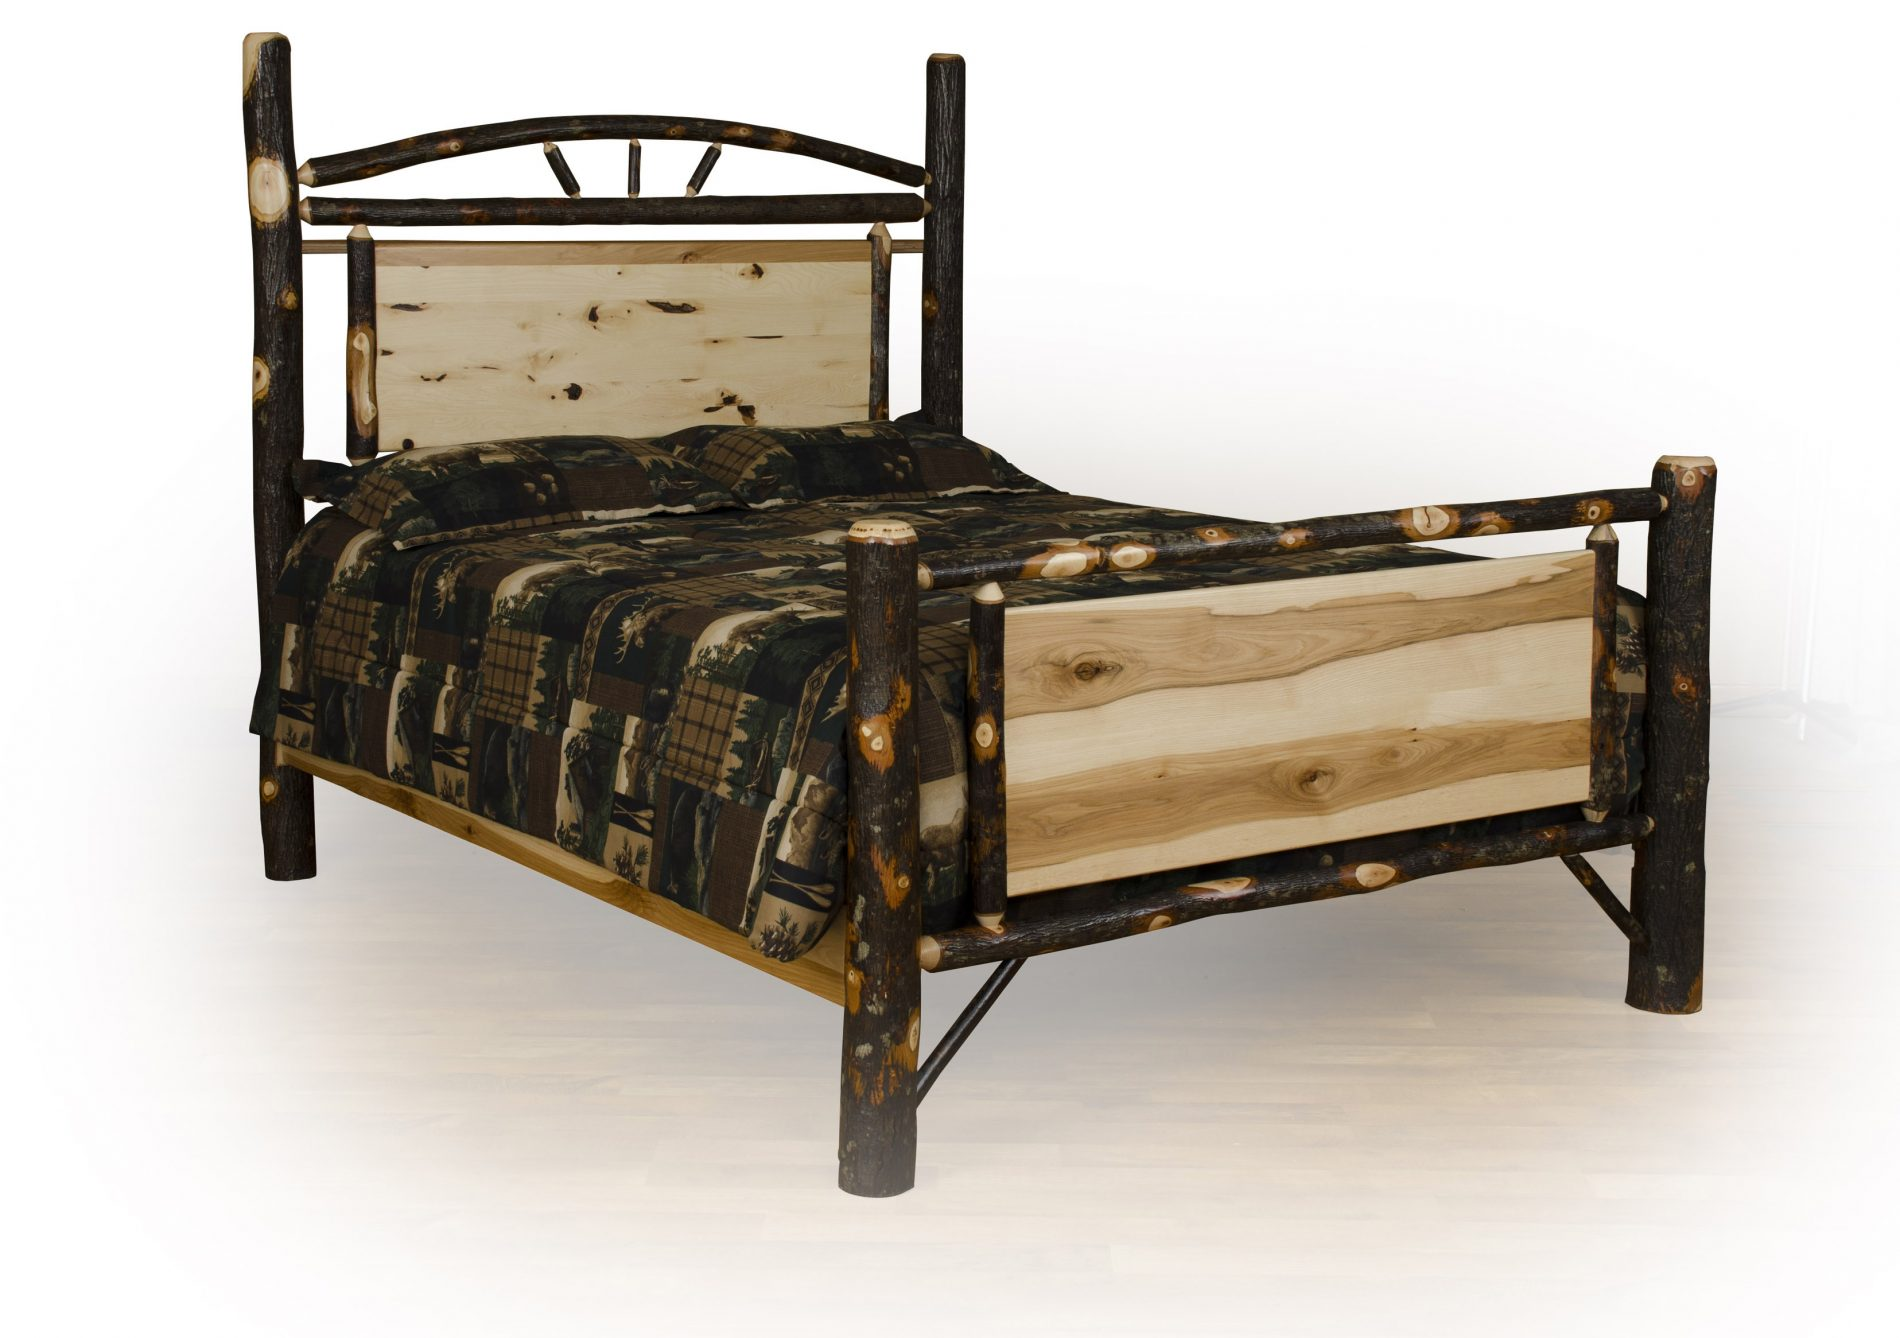 hickory chair bedside tables custom ergonomic bedroom furniture rustic wood